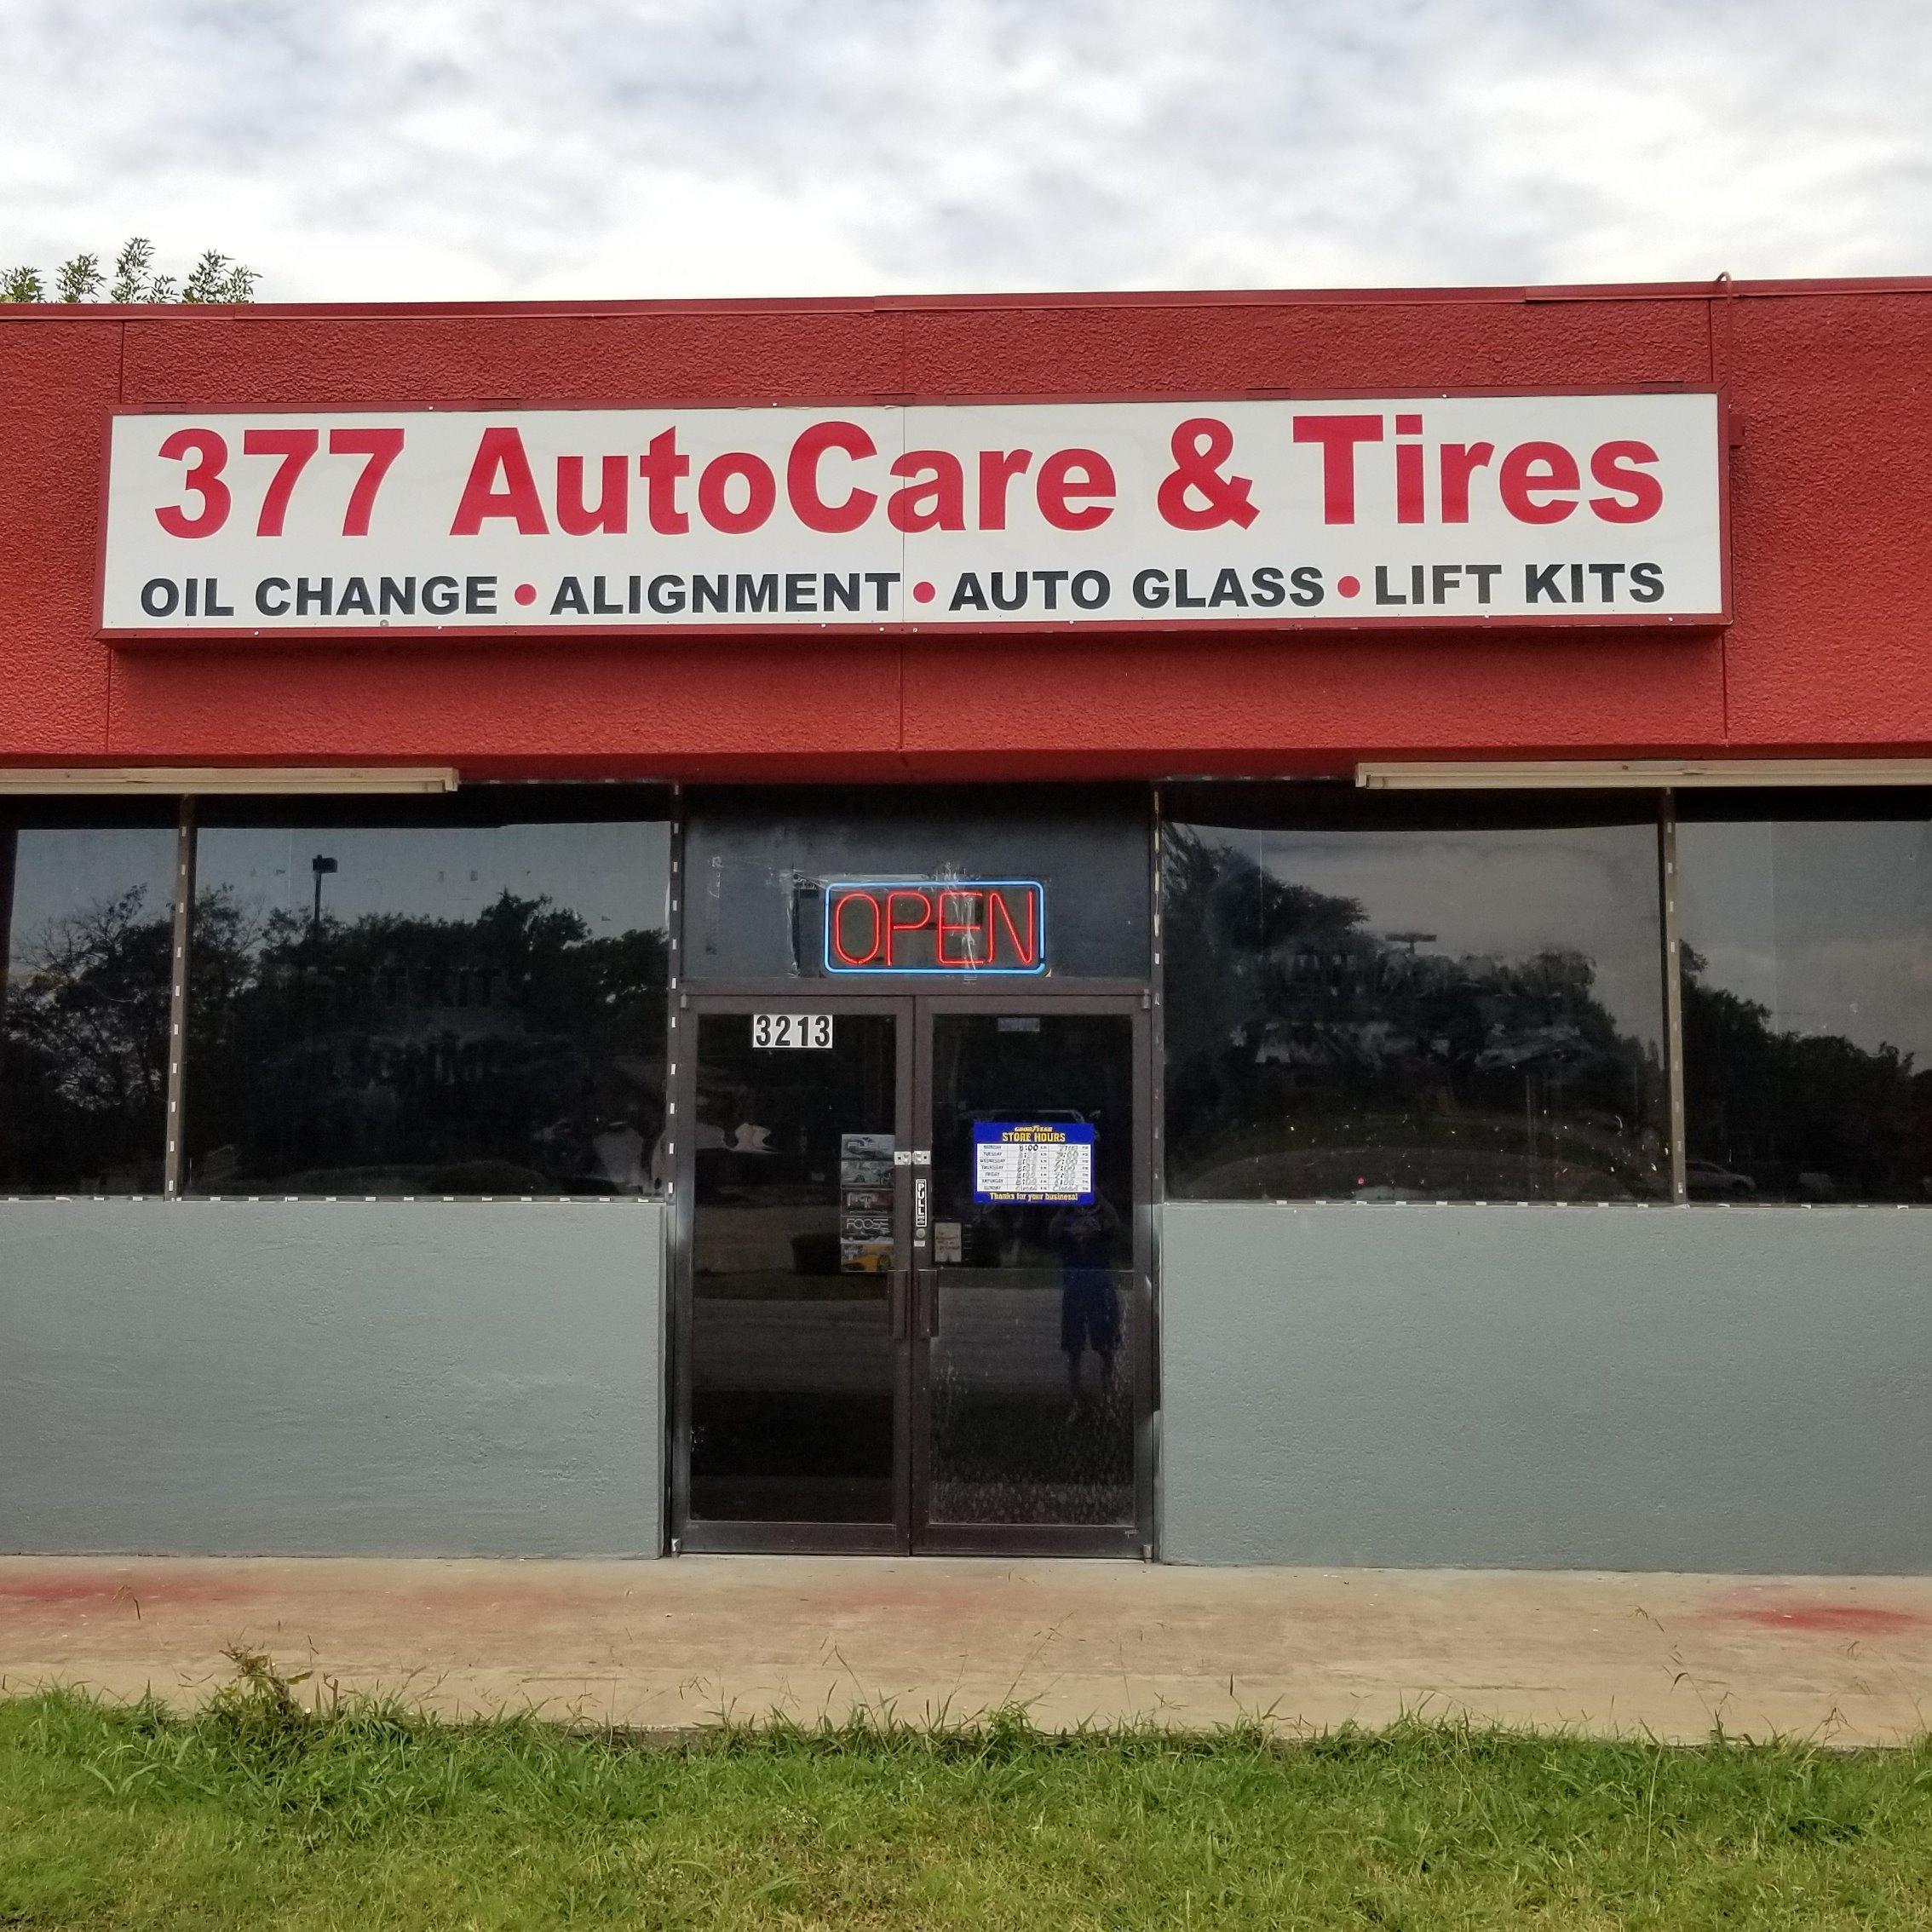 377 AutoCare & Tires